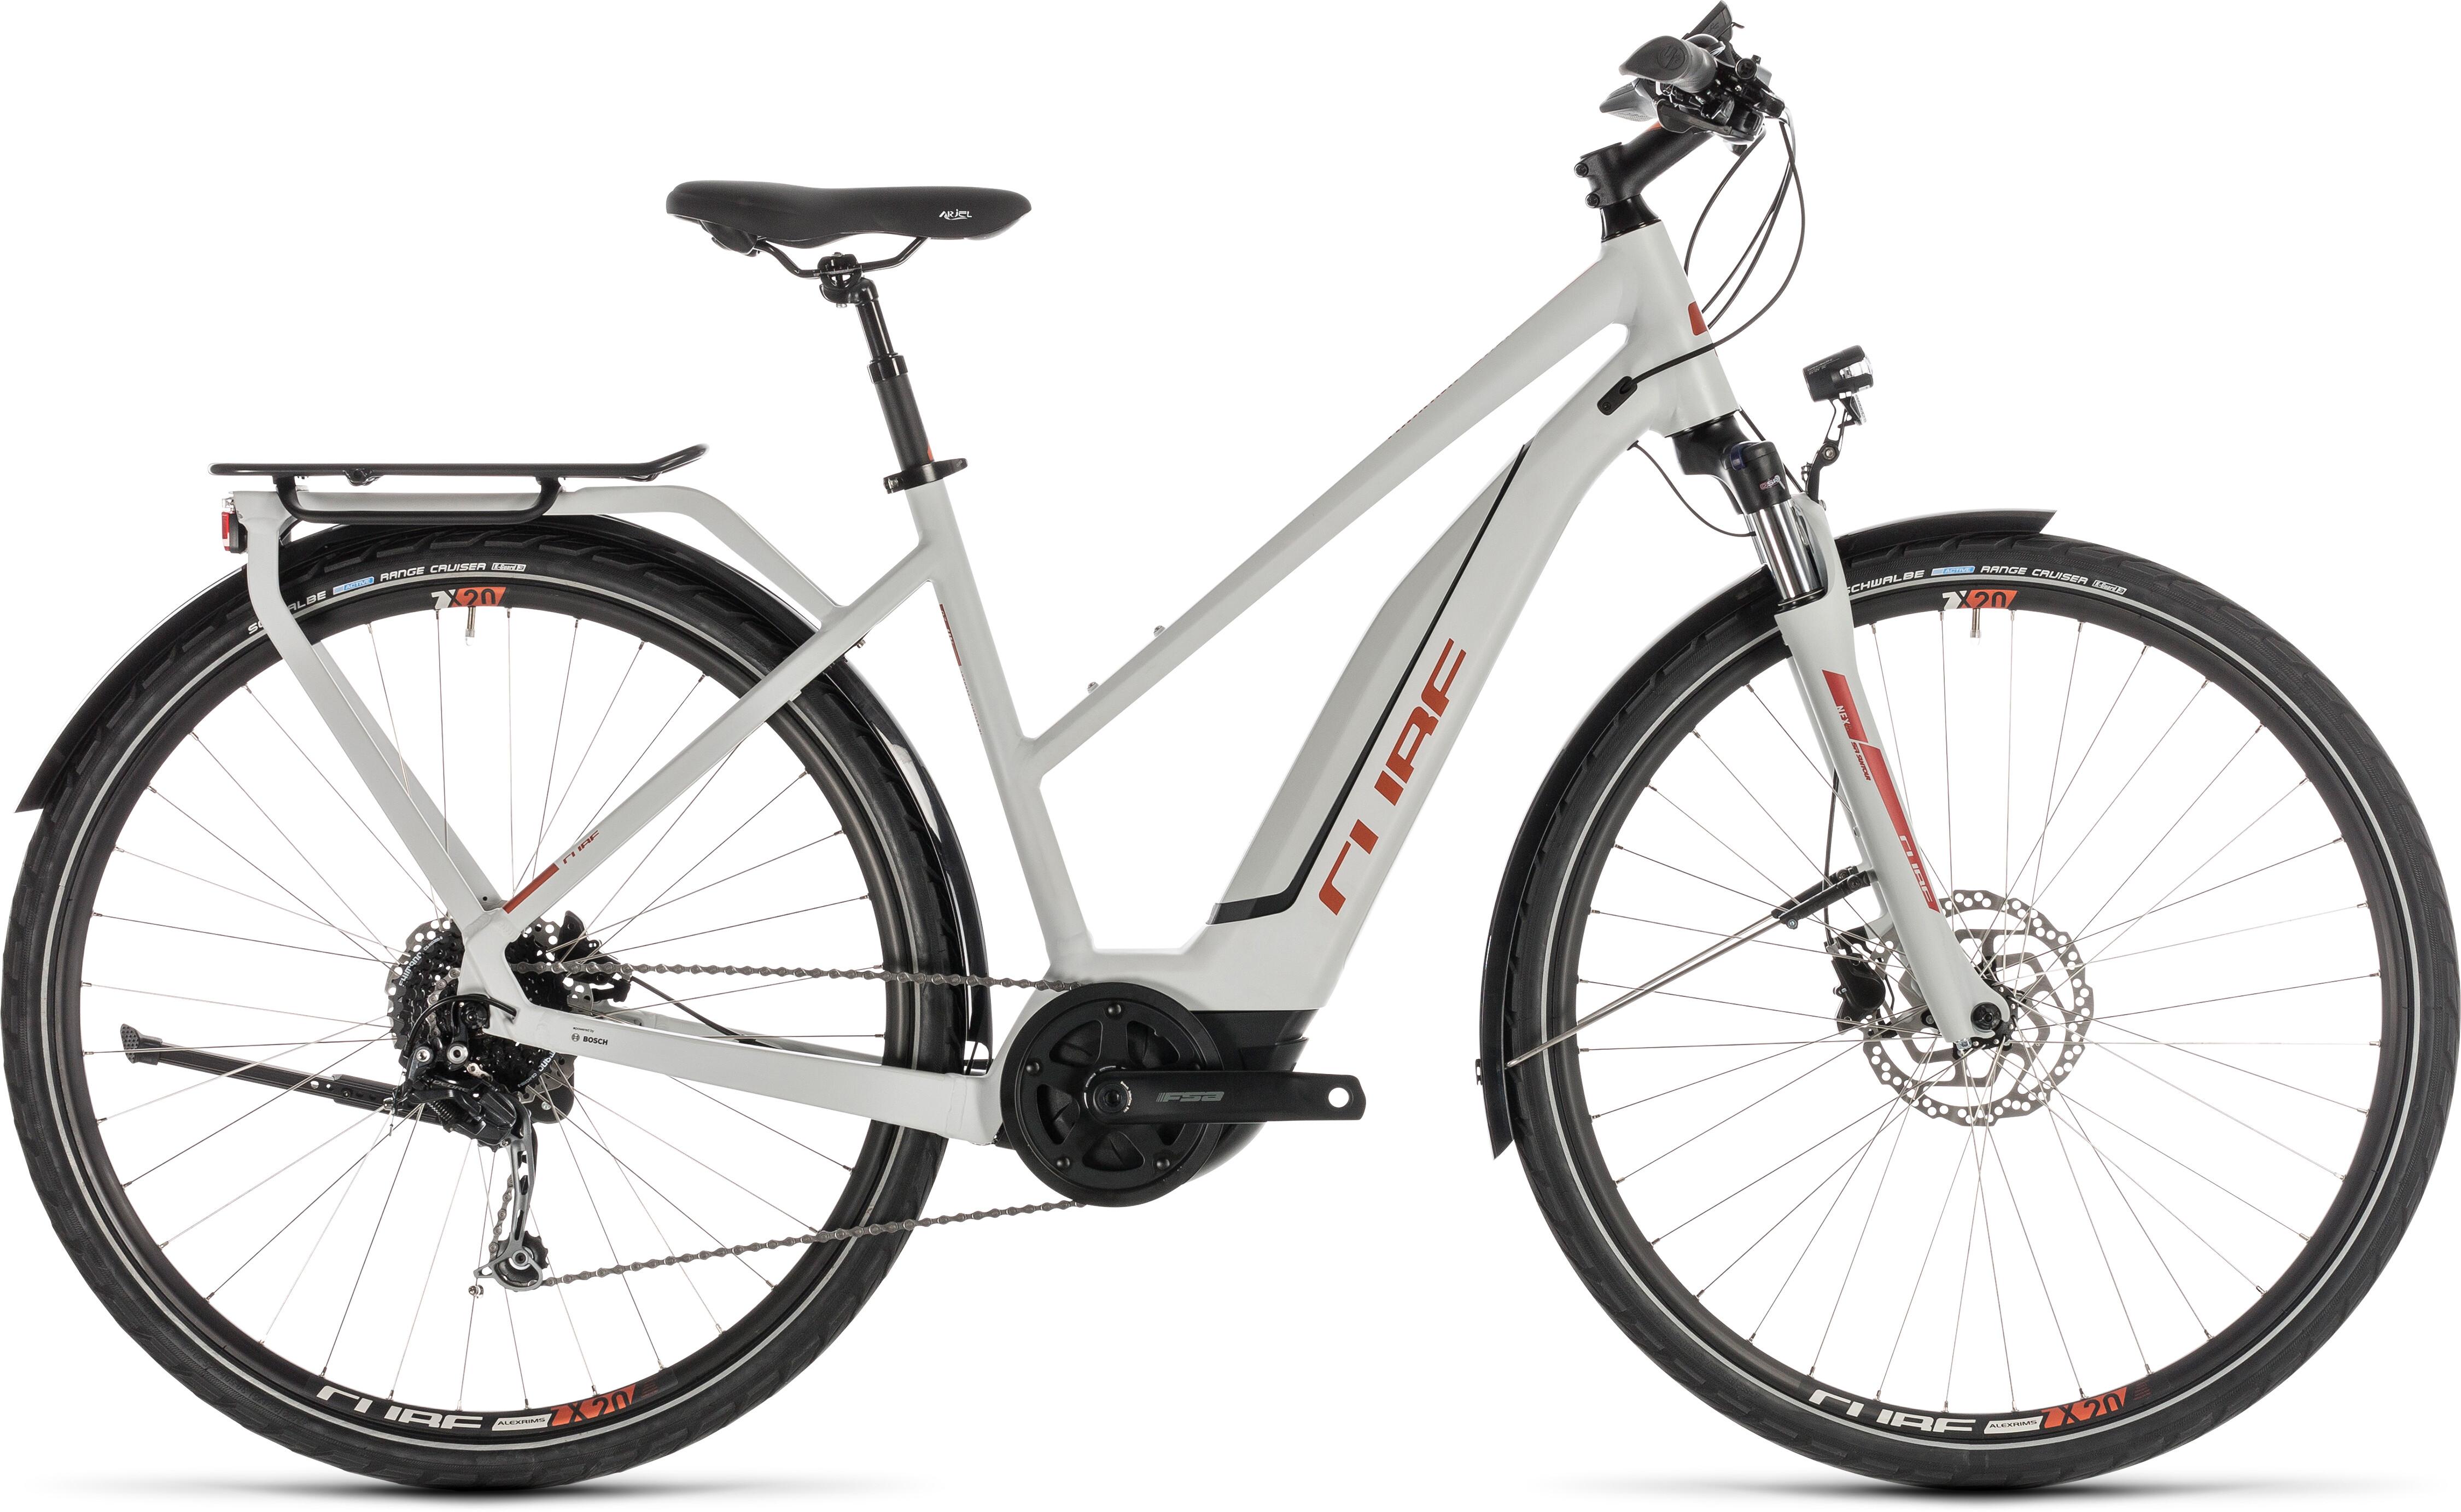 cube touring hybrid 500 e trekking bike trapez grey at. Black Bedroom Furniture Sets. Home Design Ideas